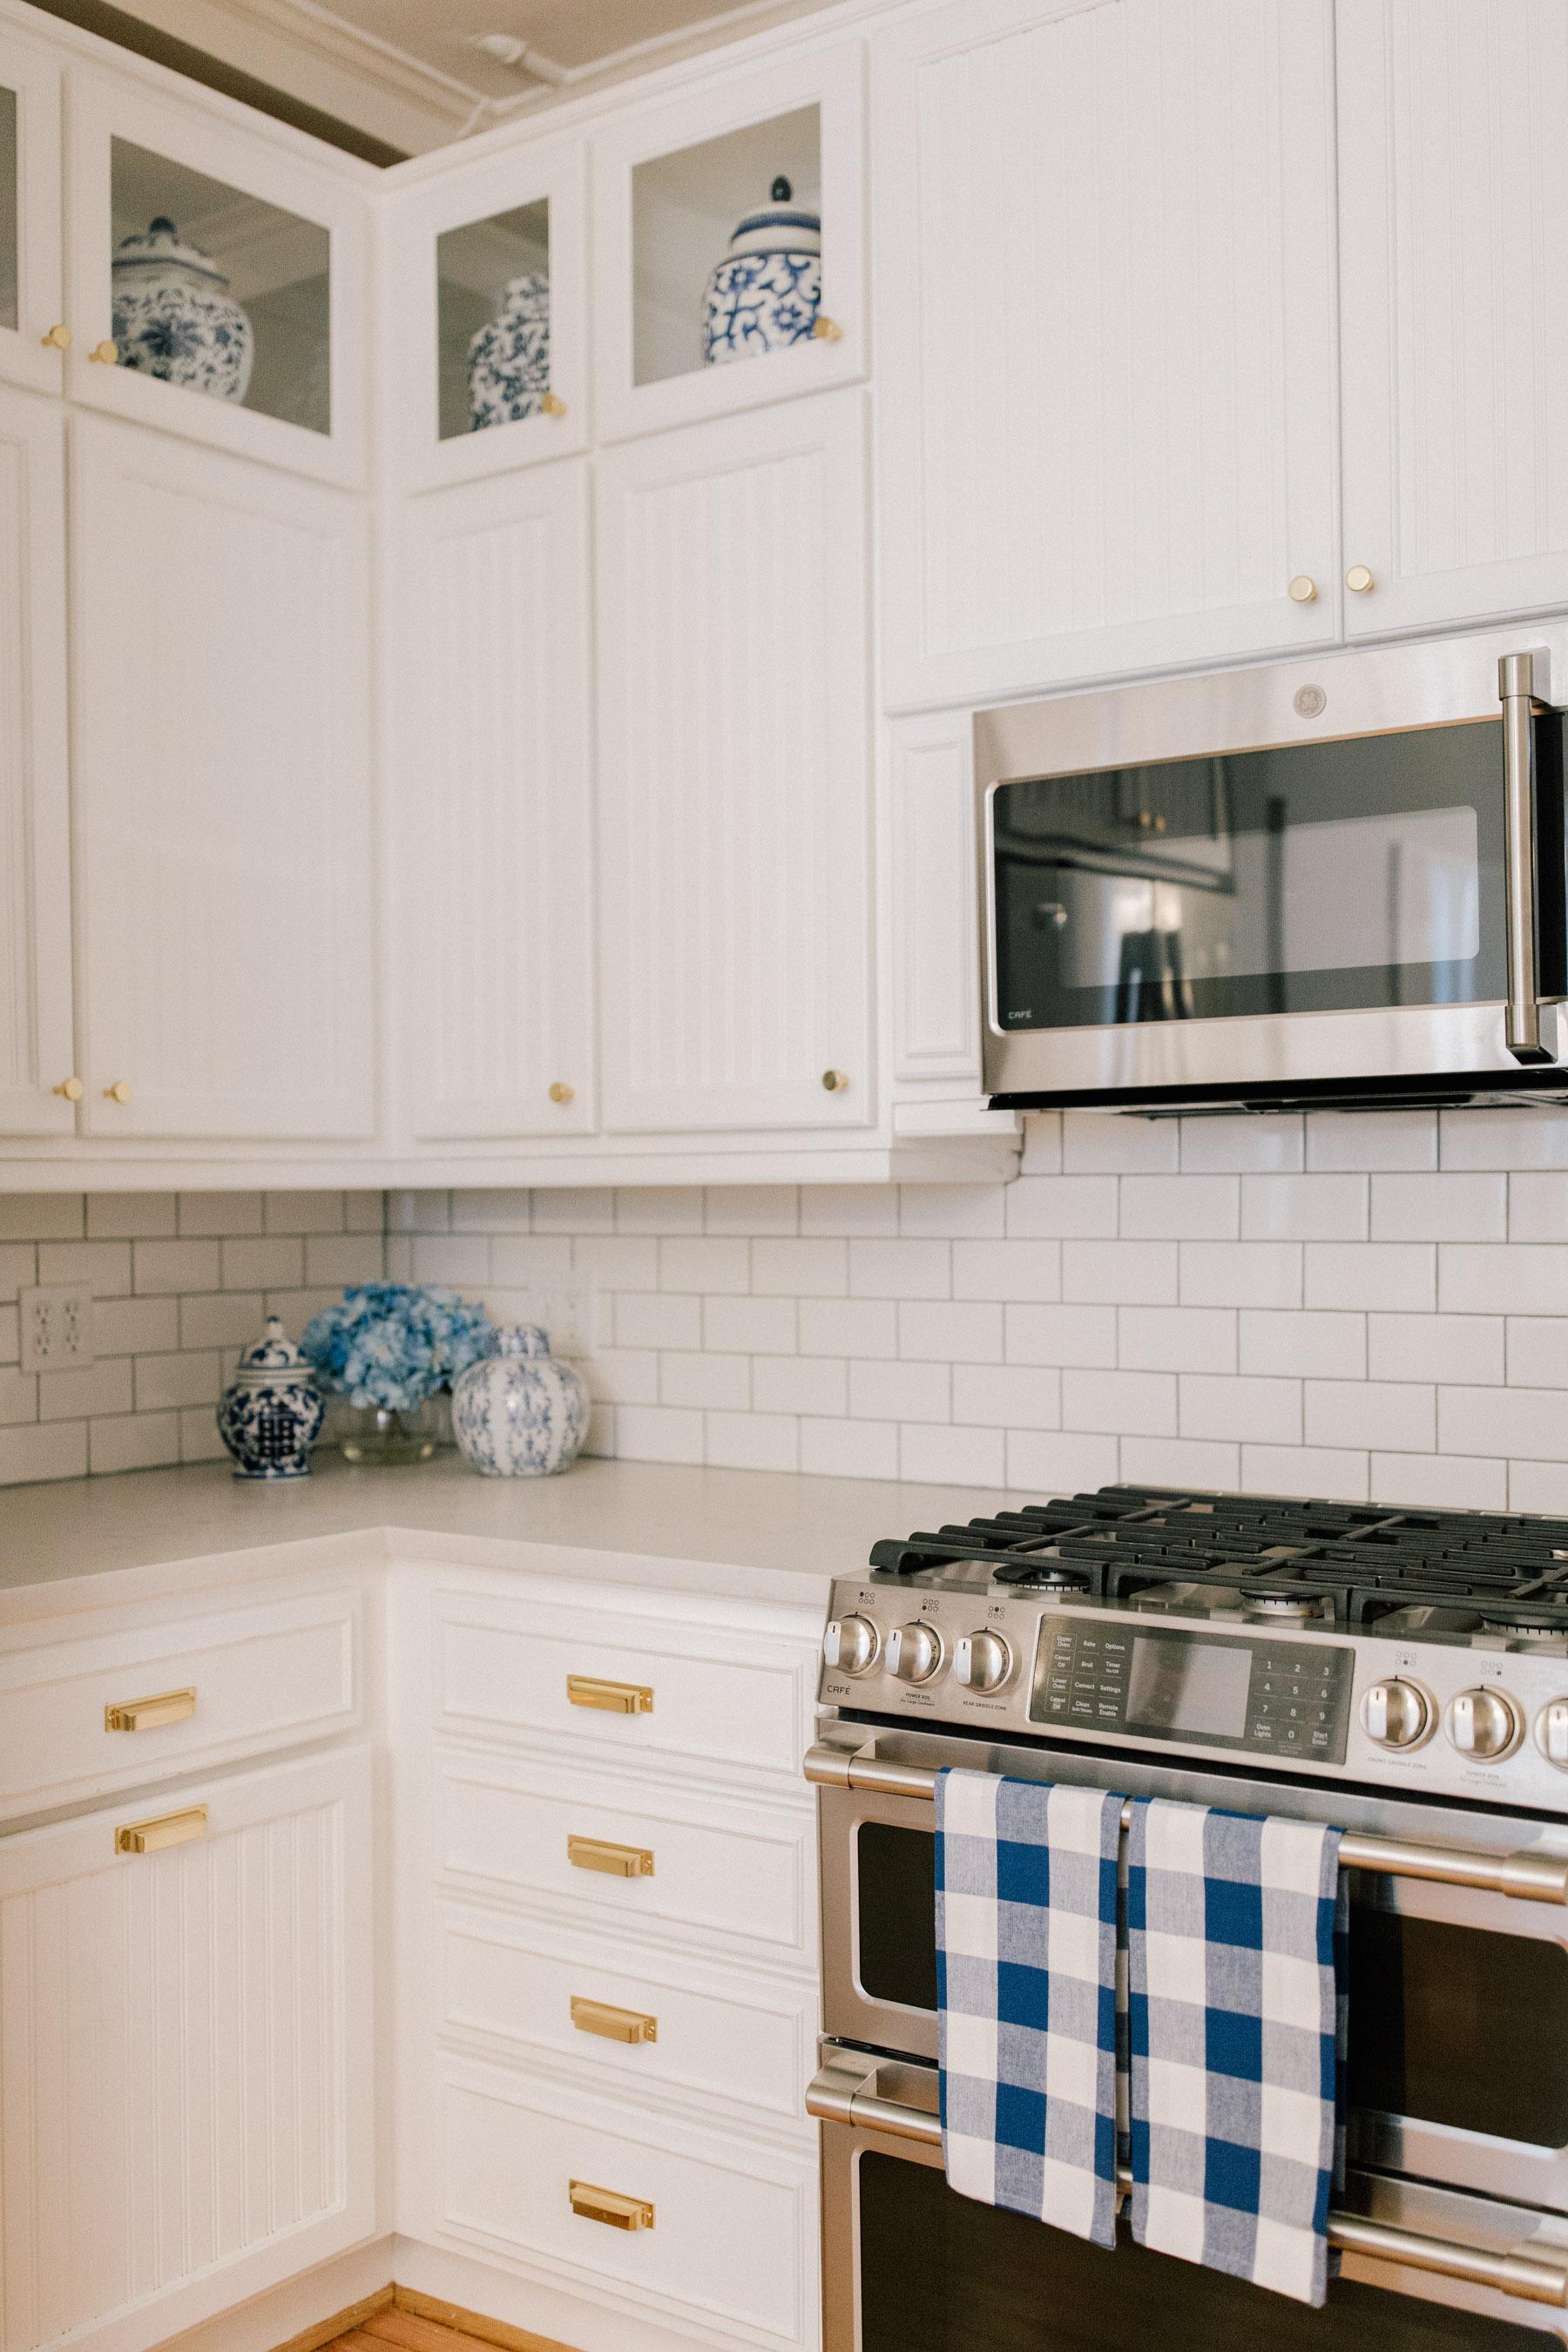 Preppy Kitchen Renovation How To Make Your Kitchen Preppy